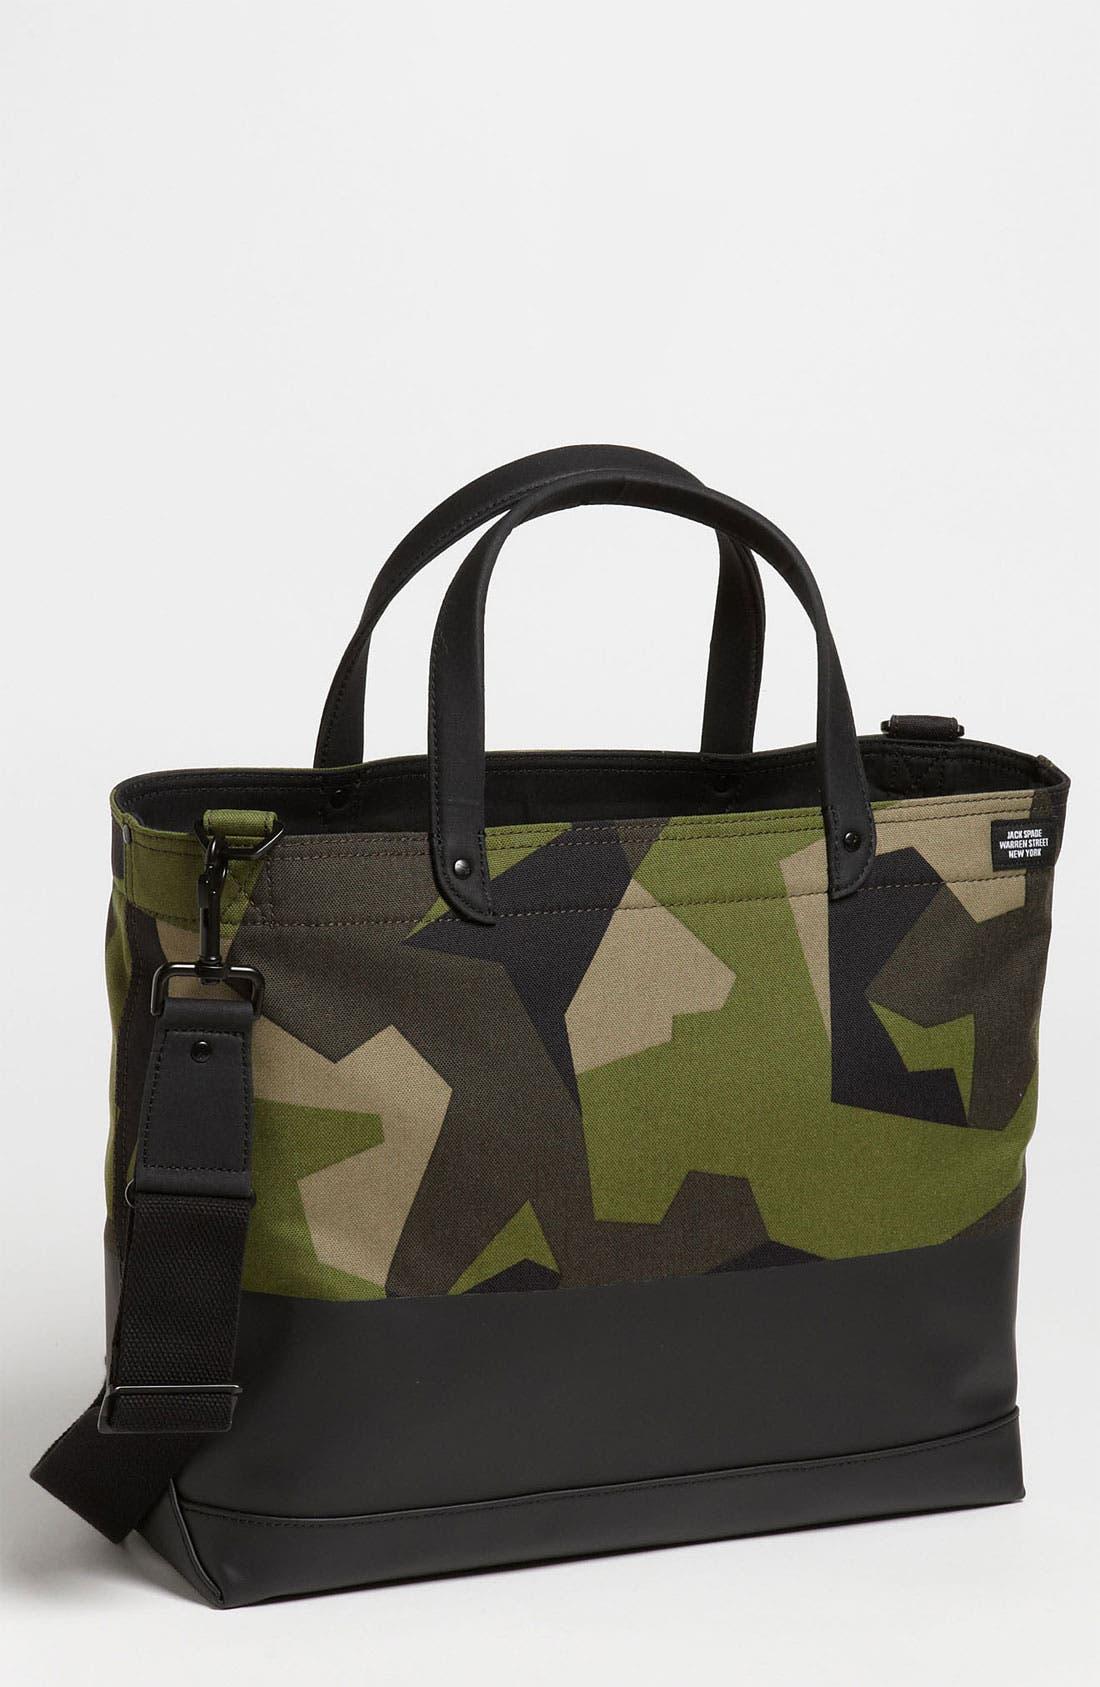 Main Image - Jack Spade 'Coal' Camo Tote Bag